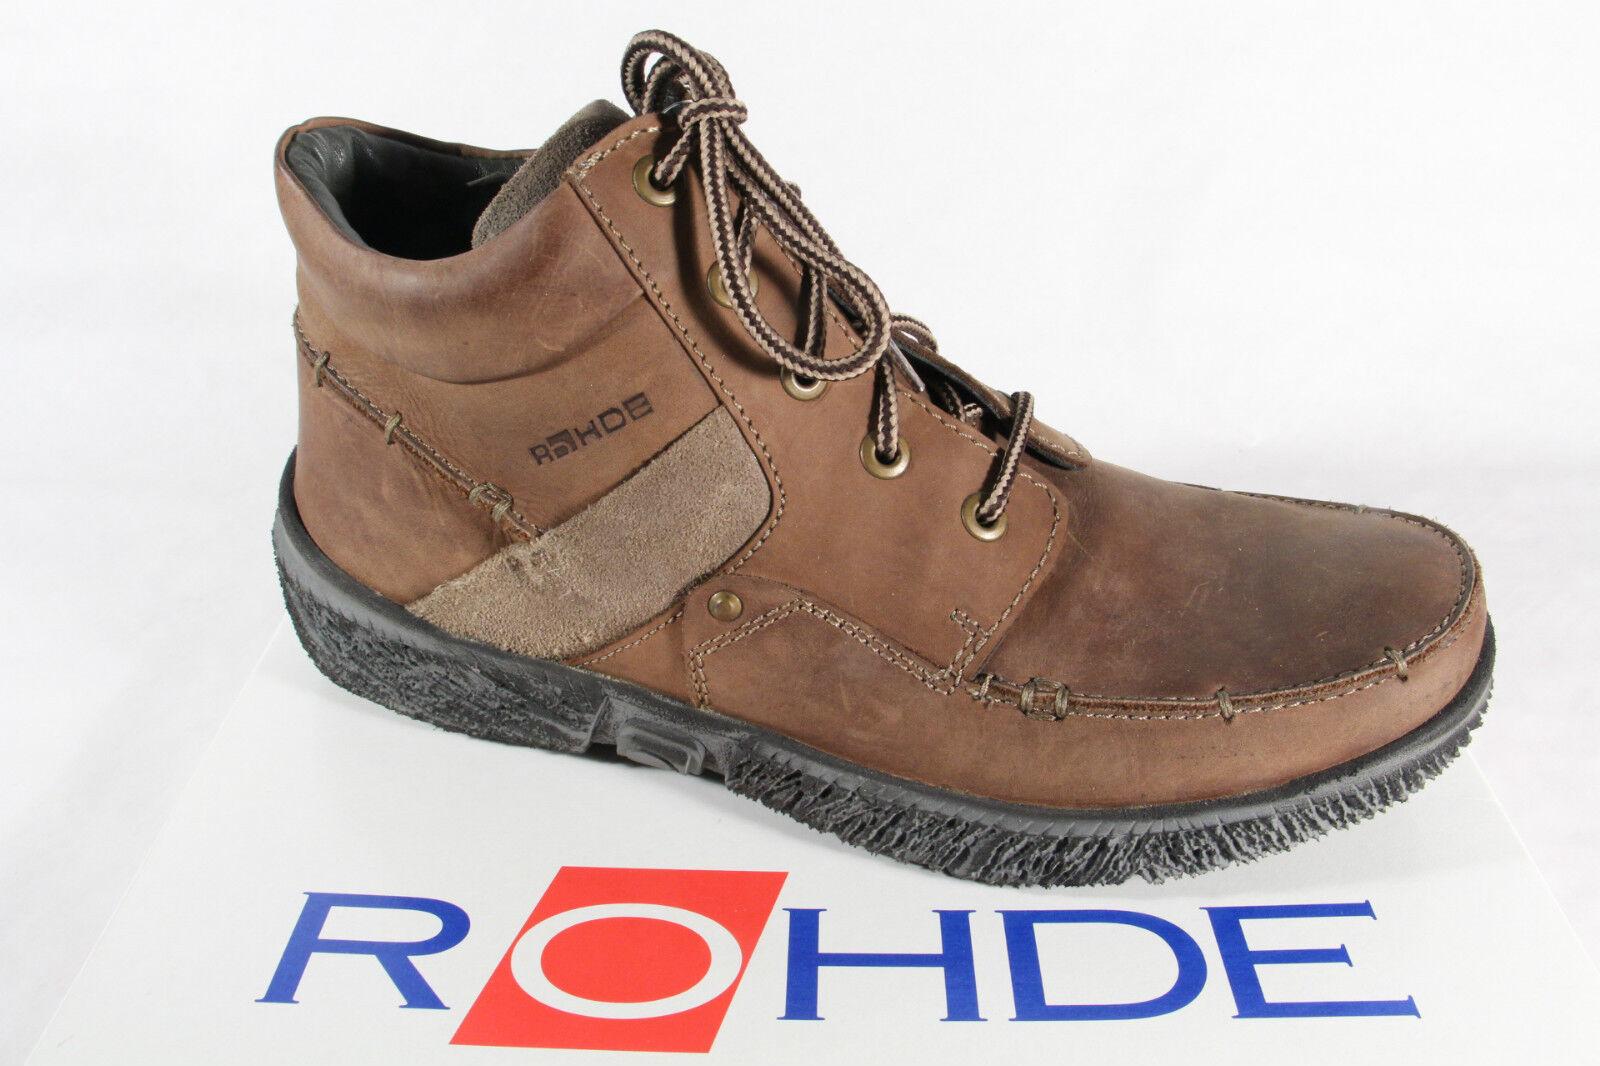 Rohde Stiefel zum Schnüren, Schnüren, zum braun, Boots Echtleder, NEU 235d6b